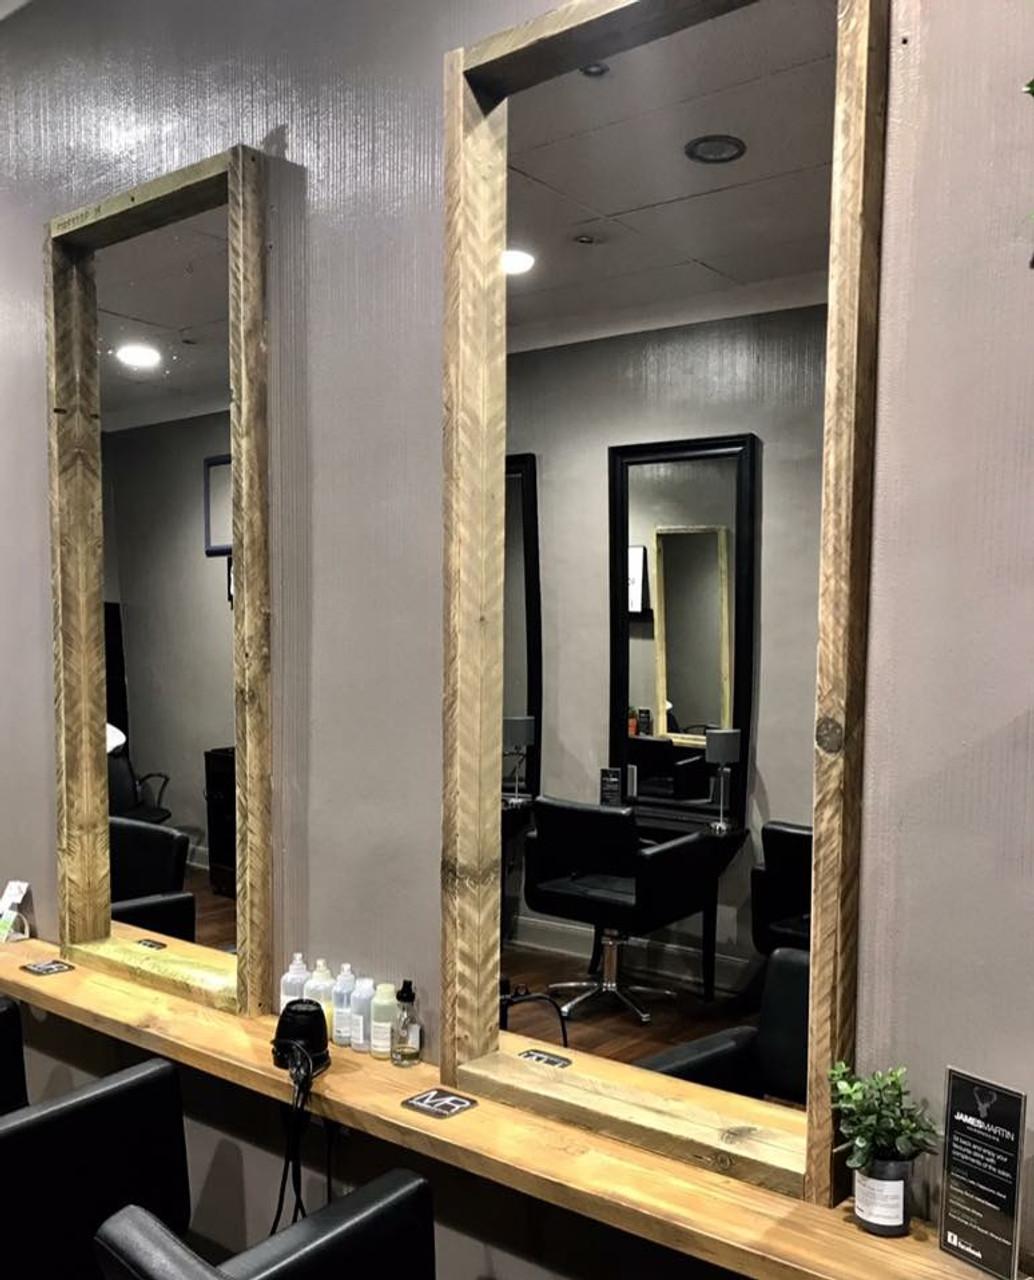 Rustic Industrial Reclaimed Wood Barber Shop Salon Mirror